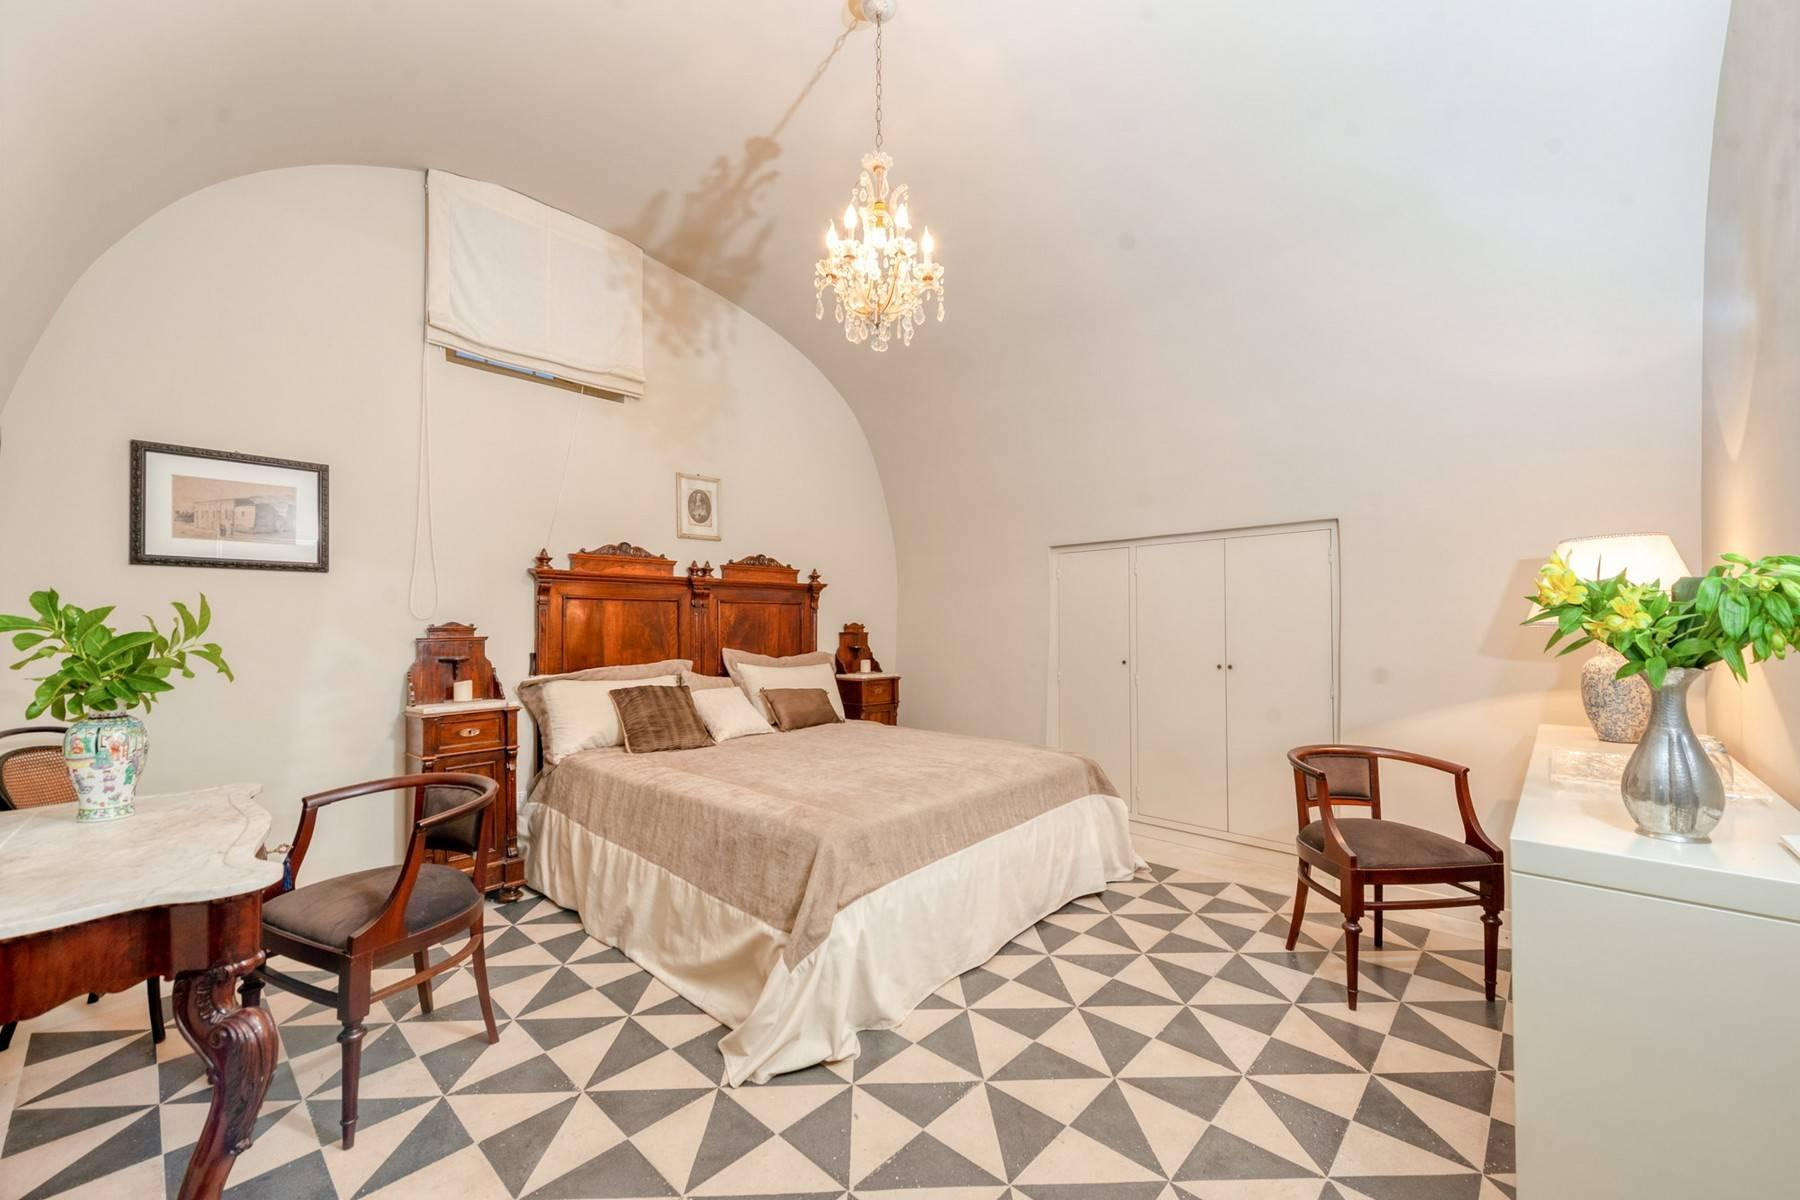 Splendida villa gentilizia del '600 circondata da agrumeti - 38